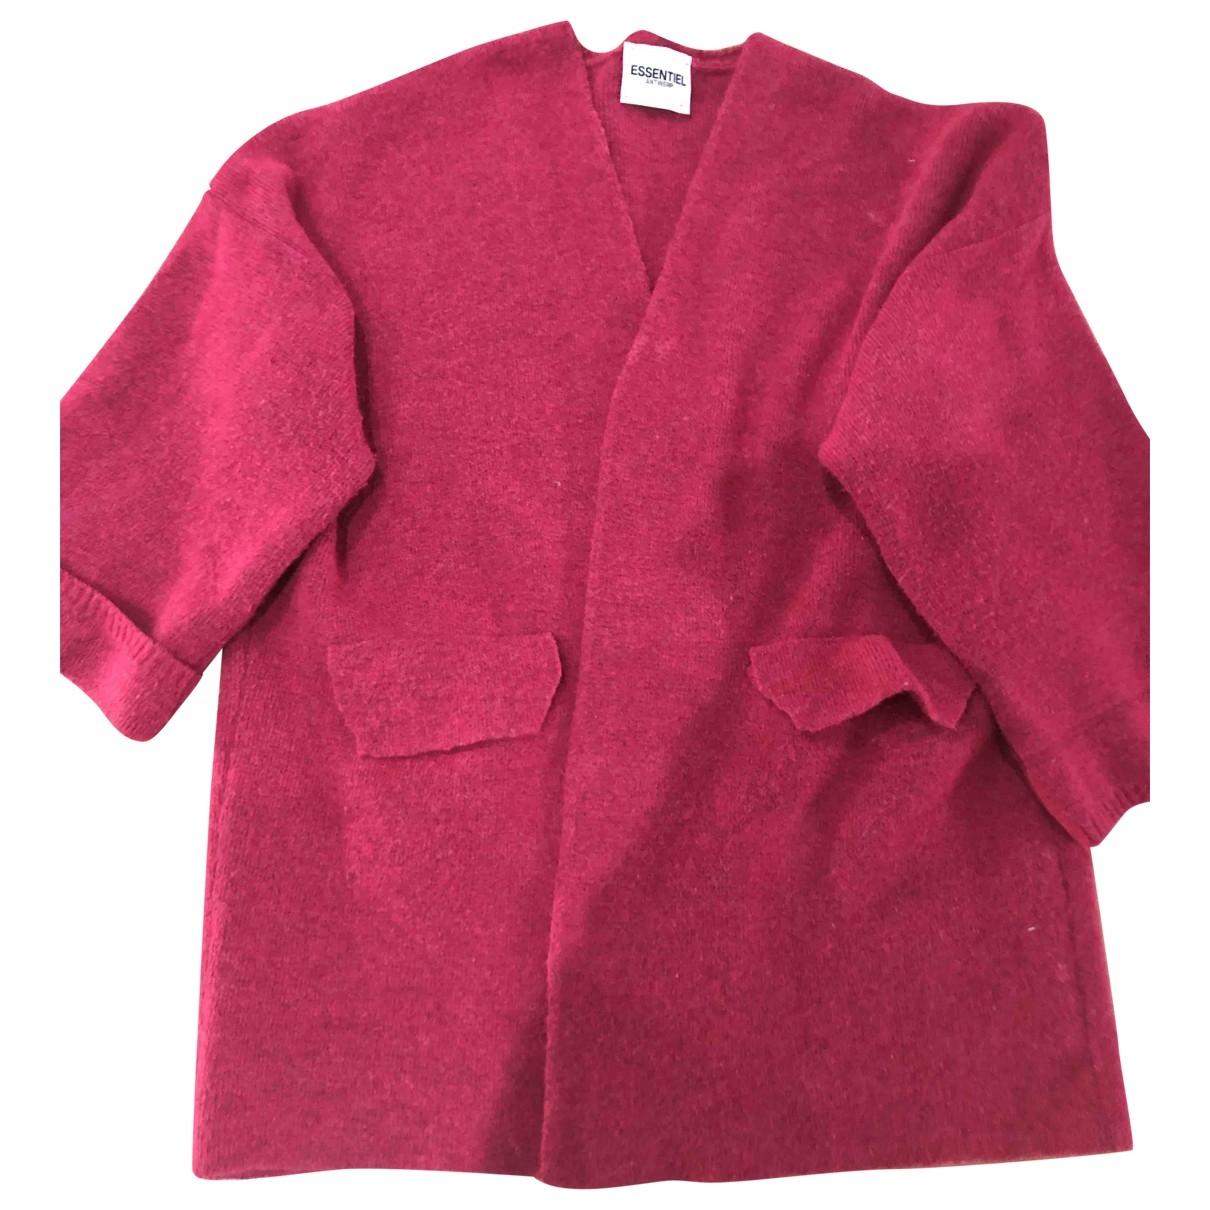 Essentiel Antwerp \N Pullover in  Rosa Polyester